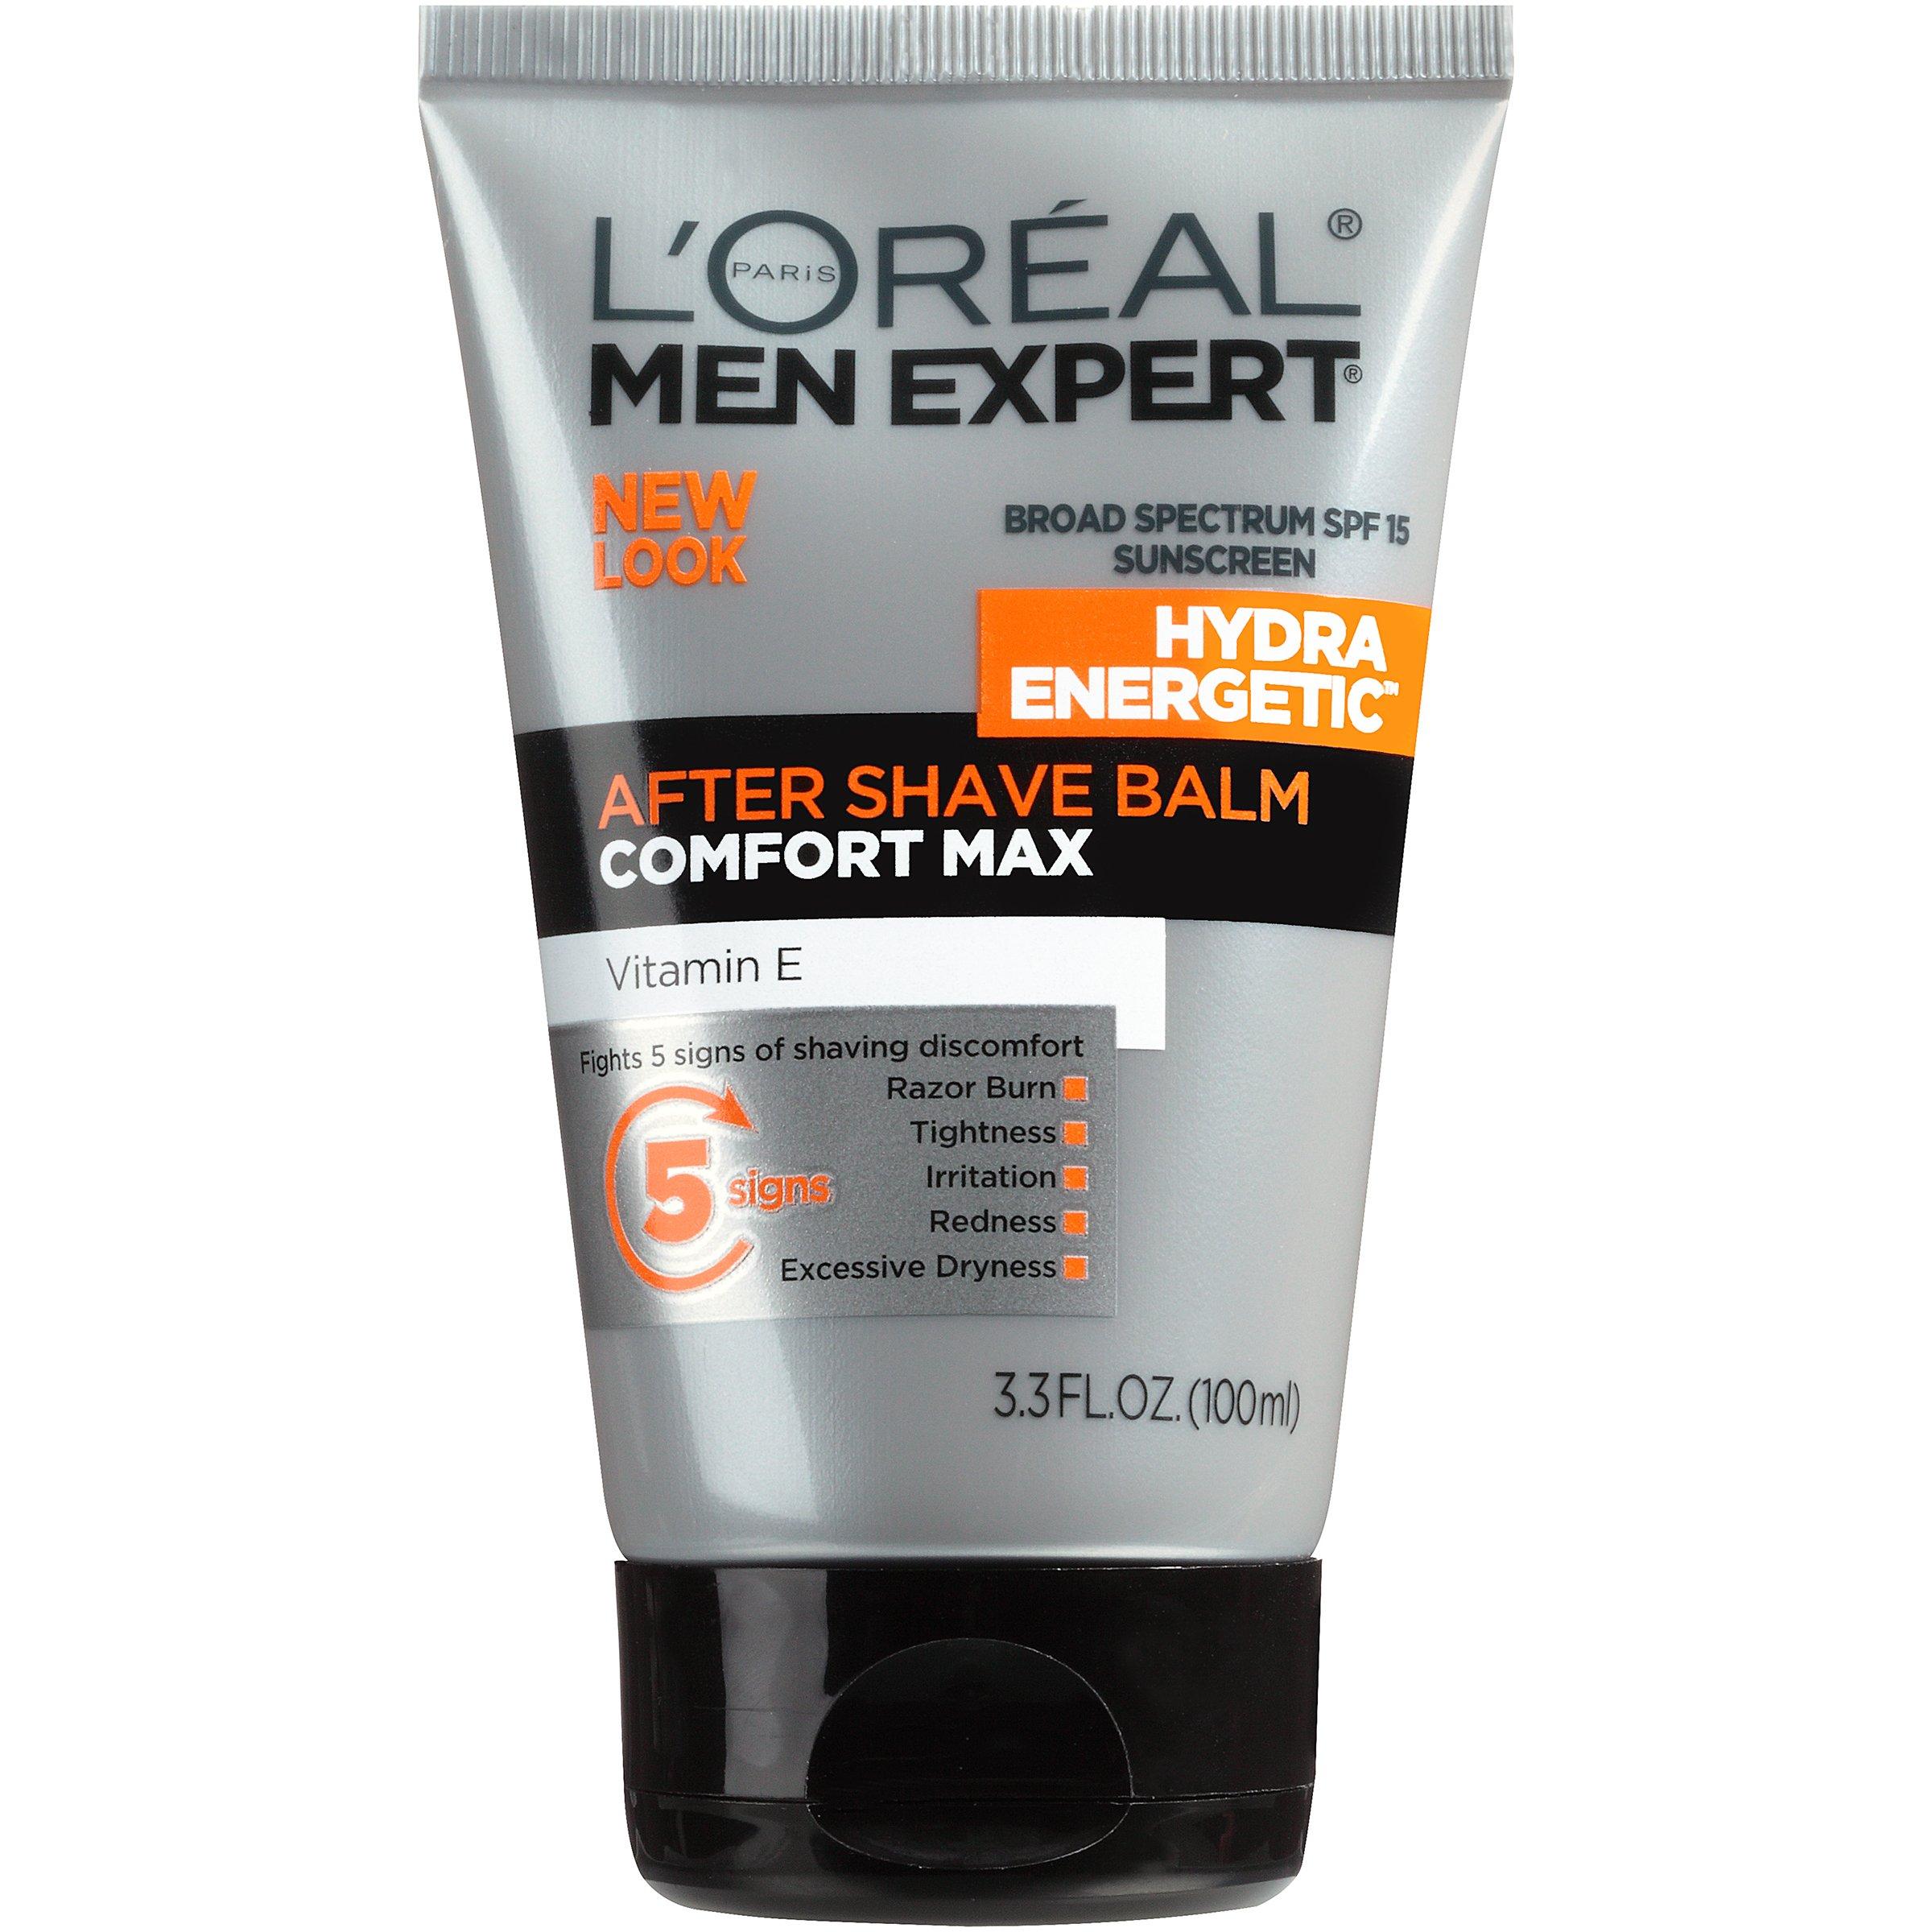 L'Oréal Paris Skincare Men Expert Hydra Energetic Aftershave Balm for Men with Vitamin E, 3.3 fl. oz.